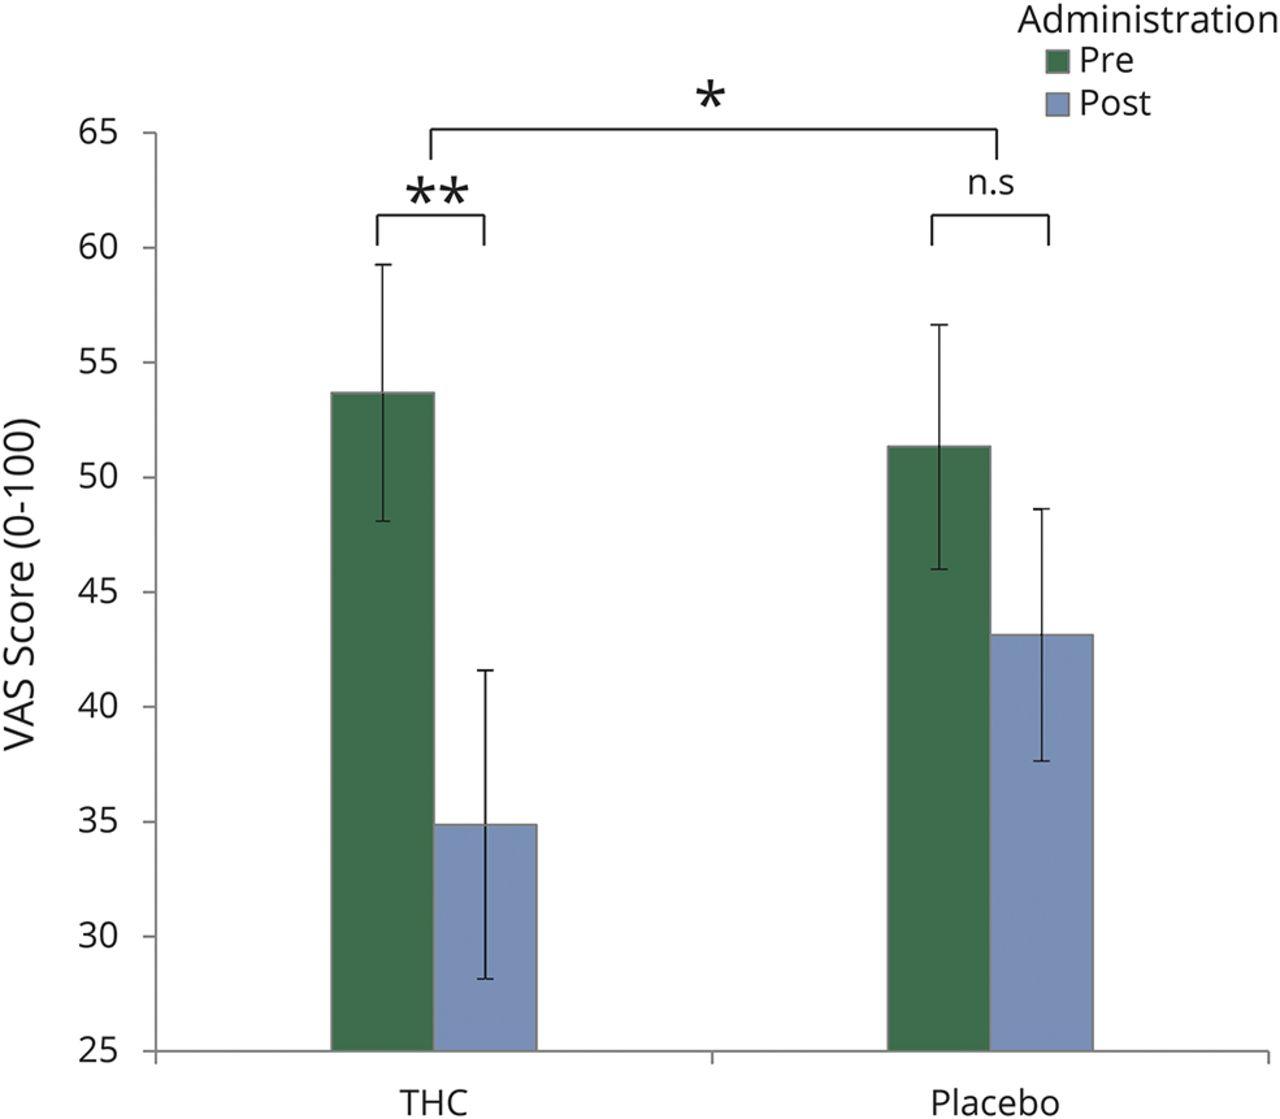 Cannabis analgesia in chronic neuropathic pain is associated